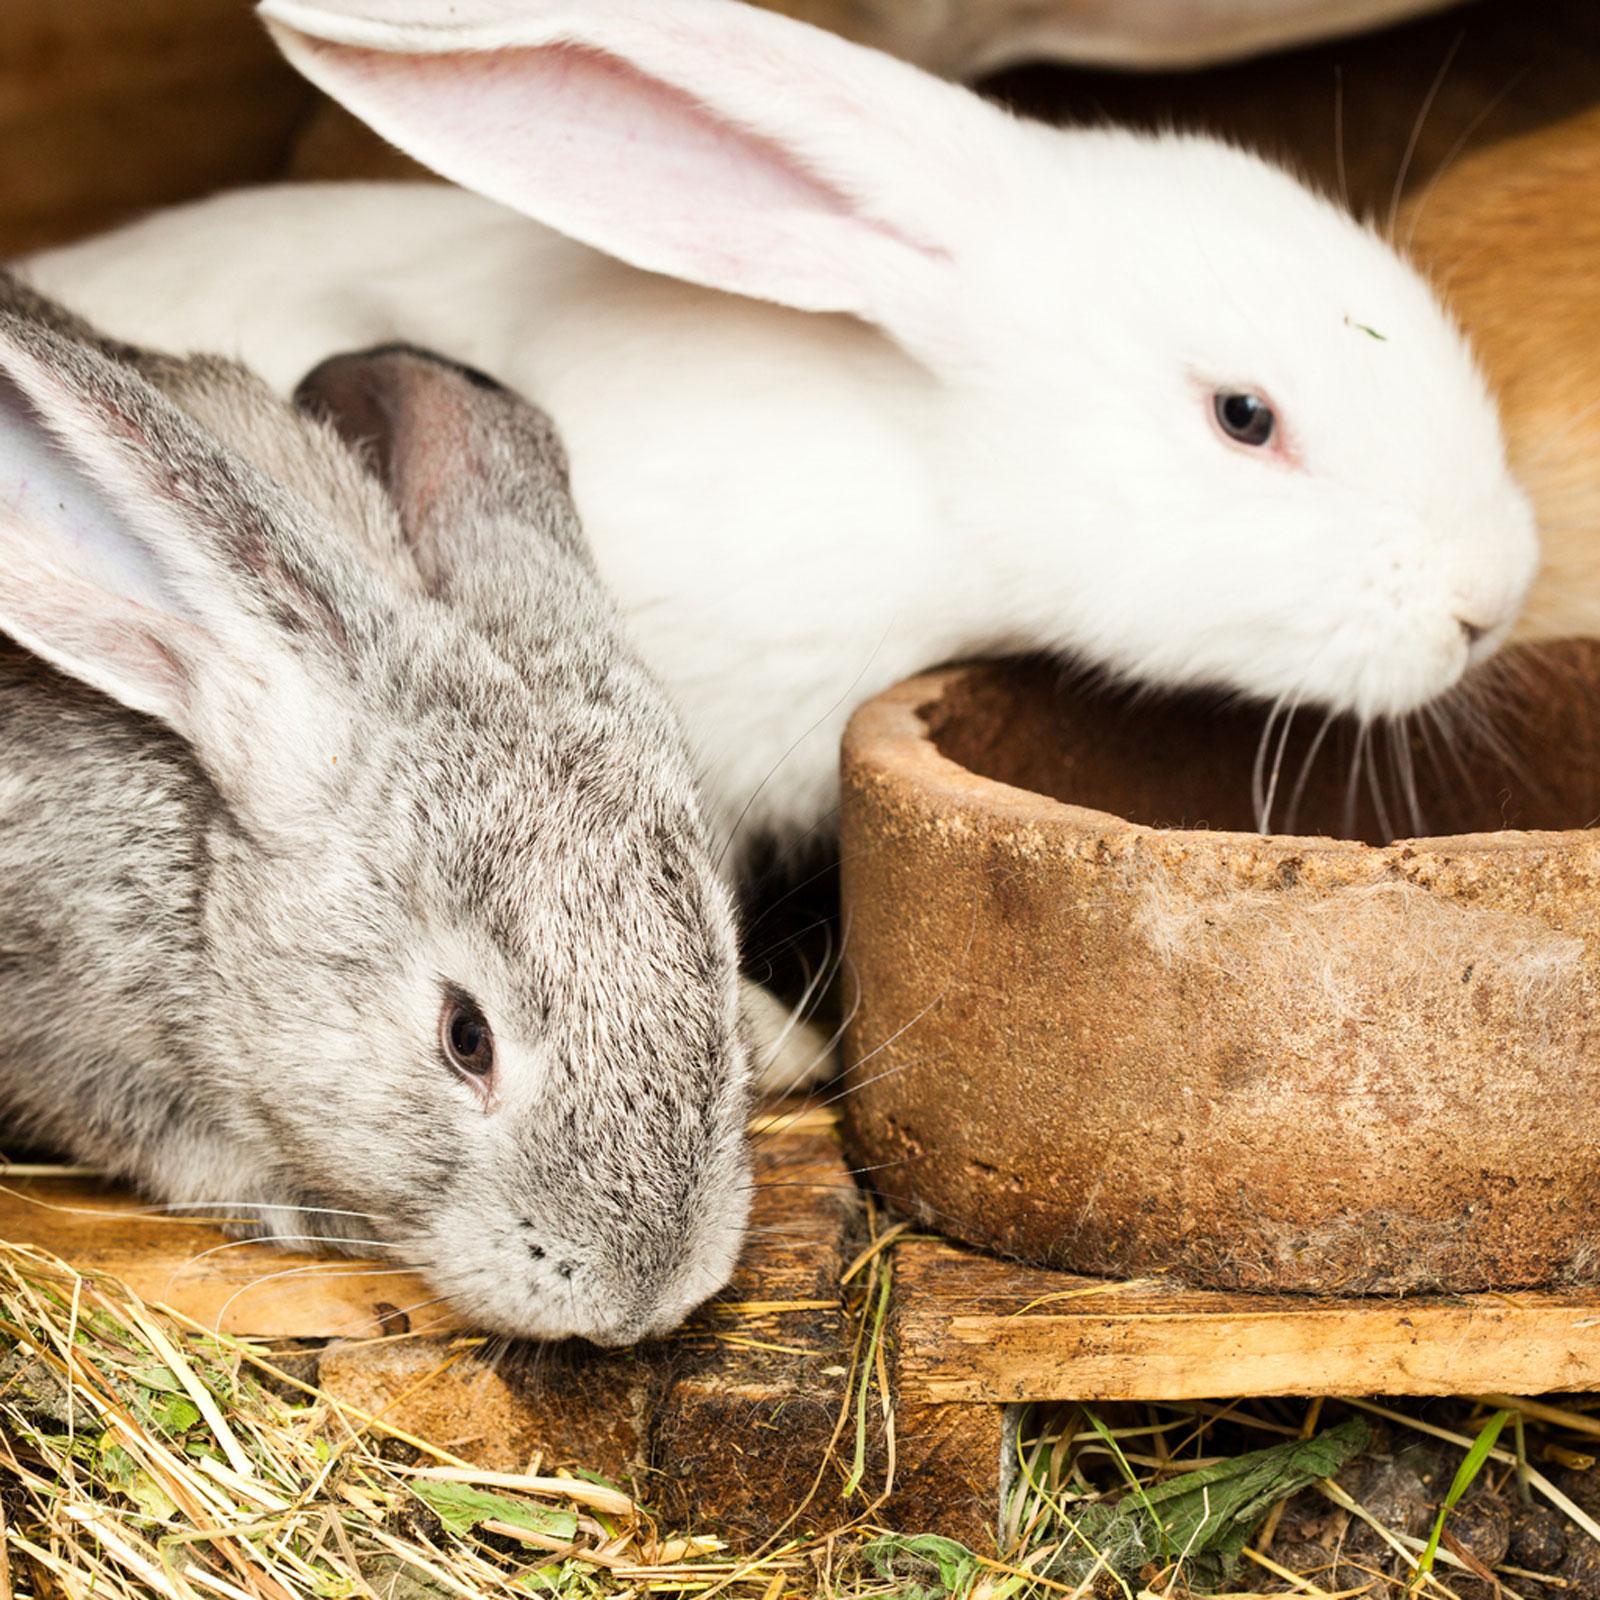 Rabbit-Manure